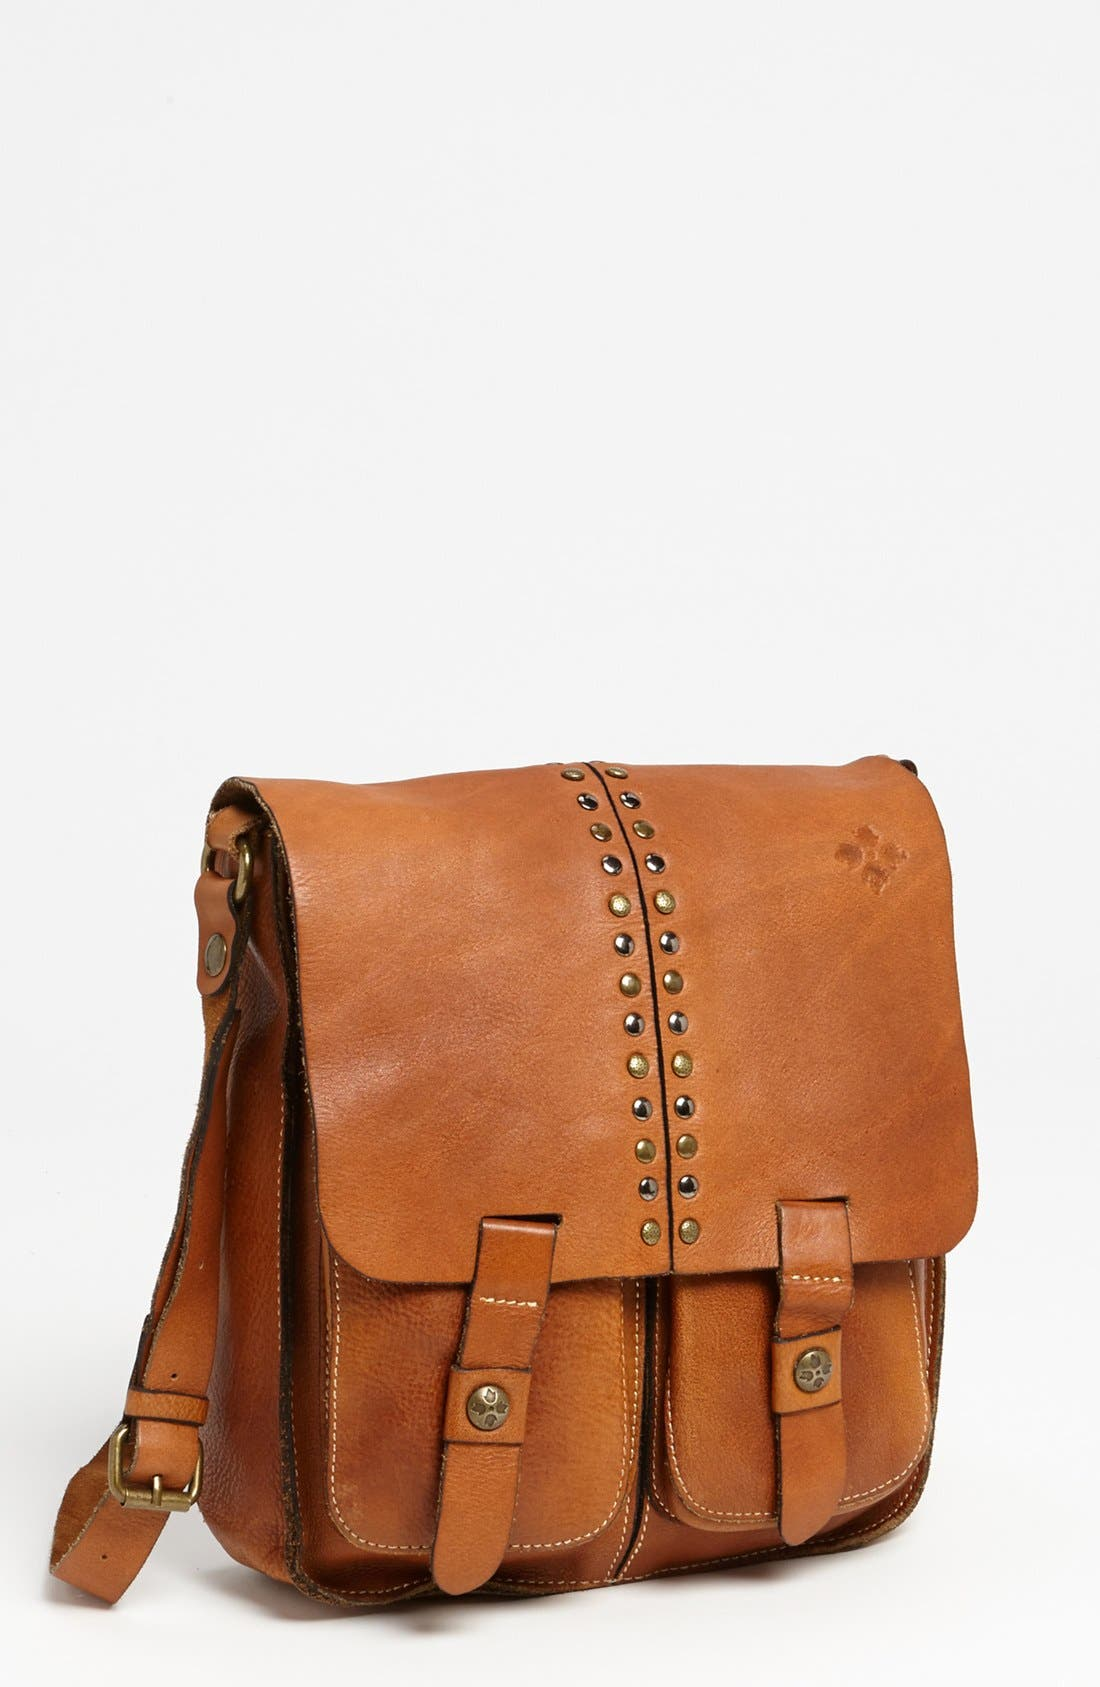 Main Image - Patricia Nash 'Armeno' Leather Messenger Bag